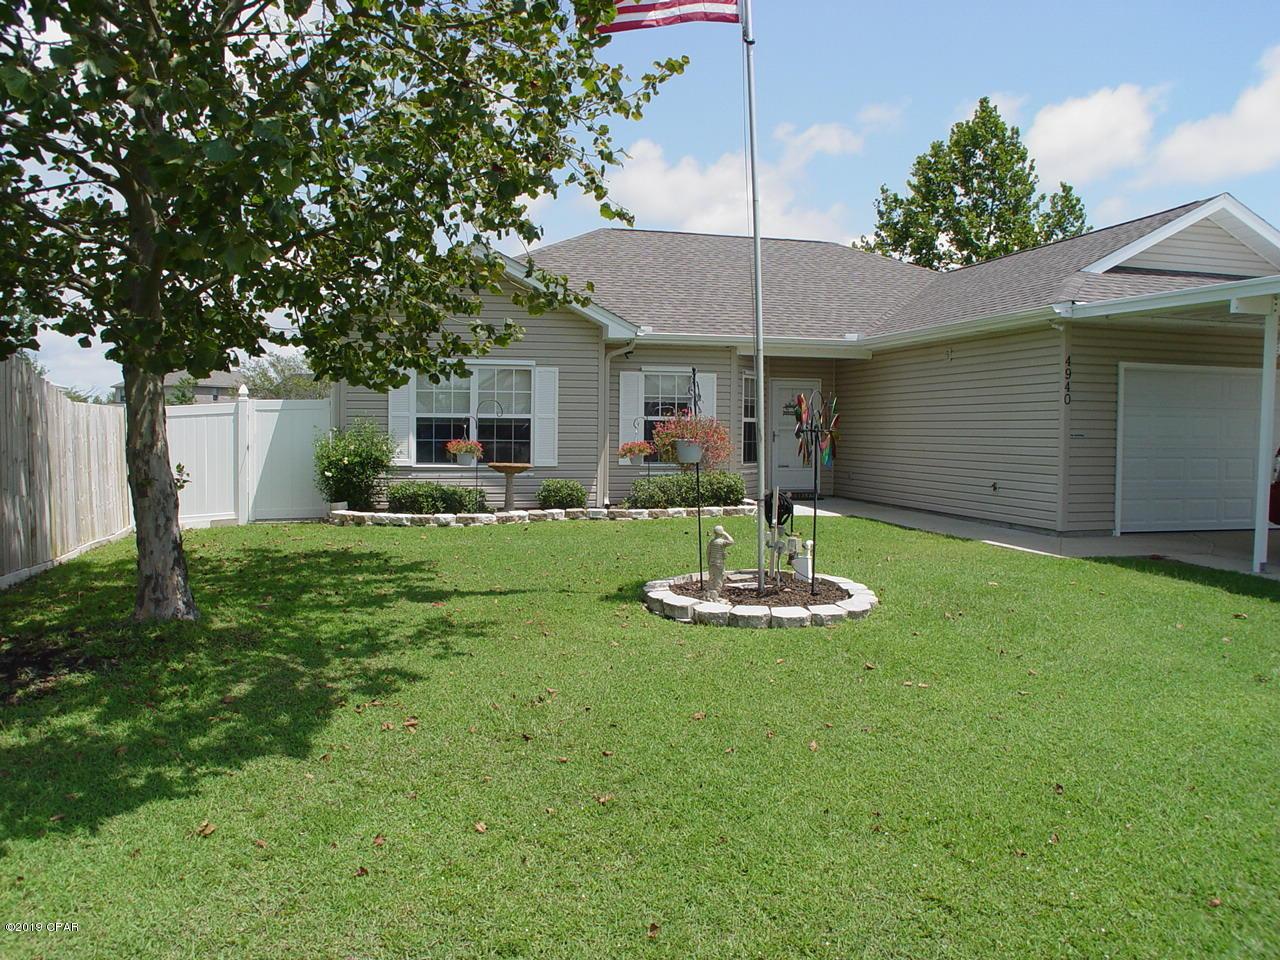 Property ID 687394